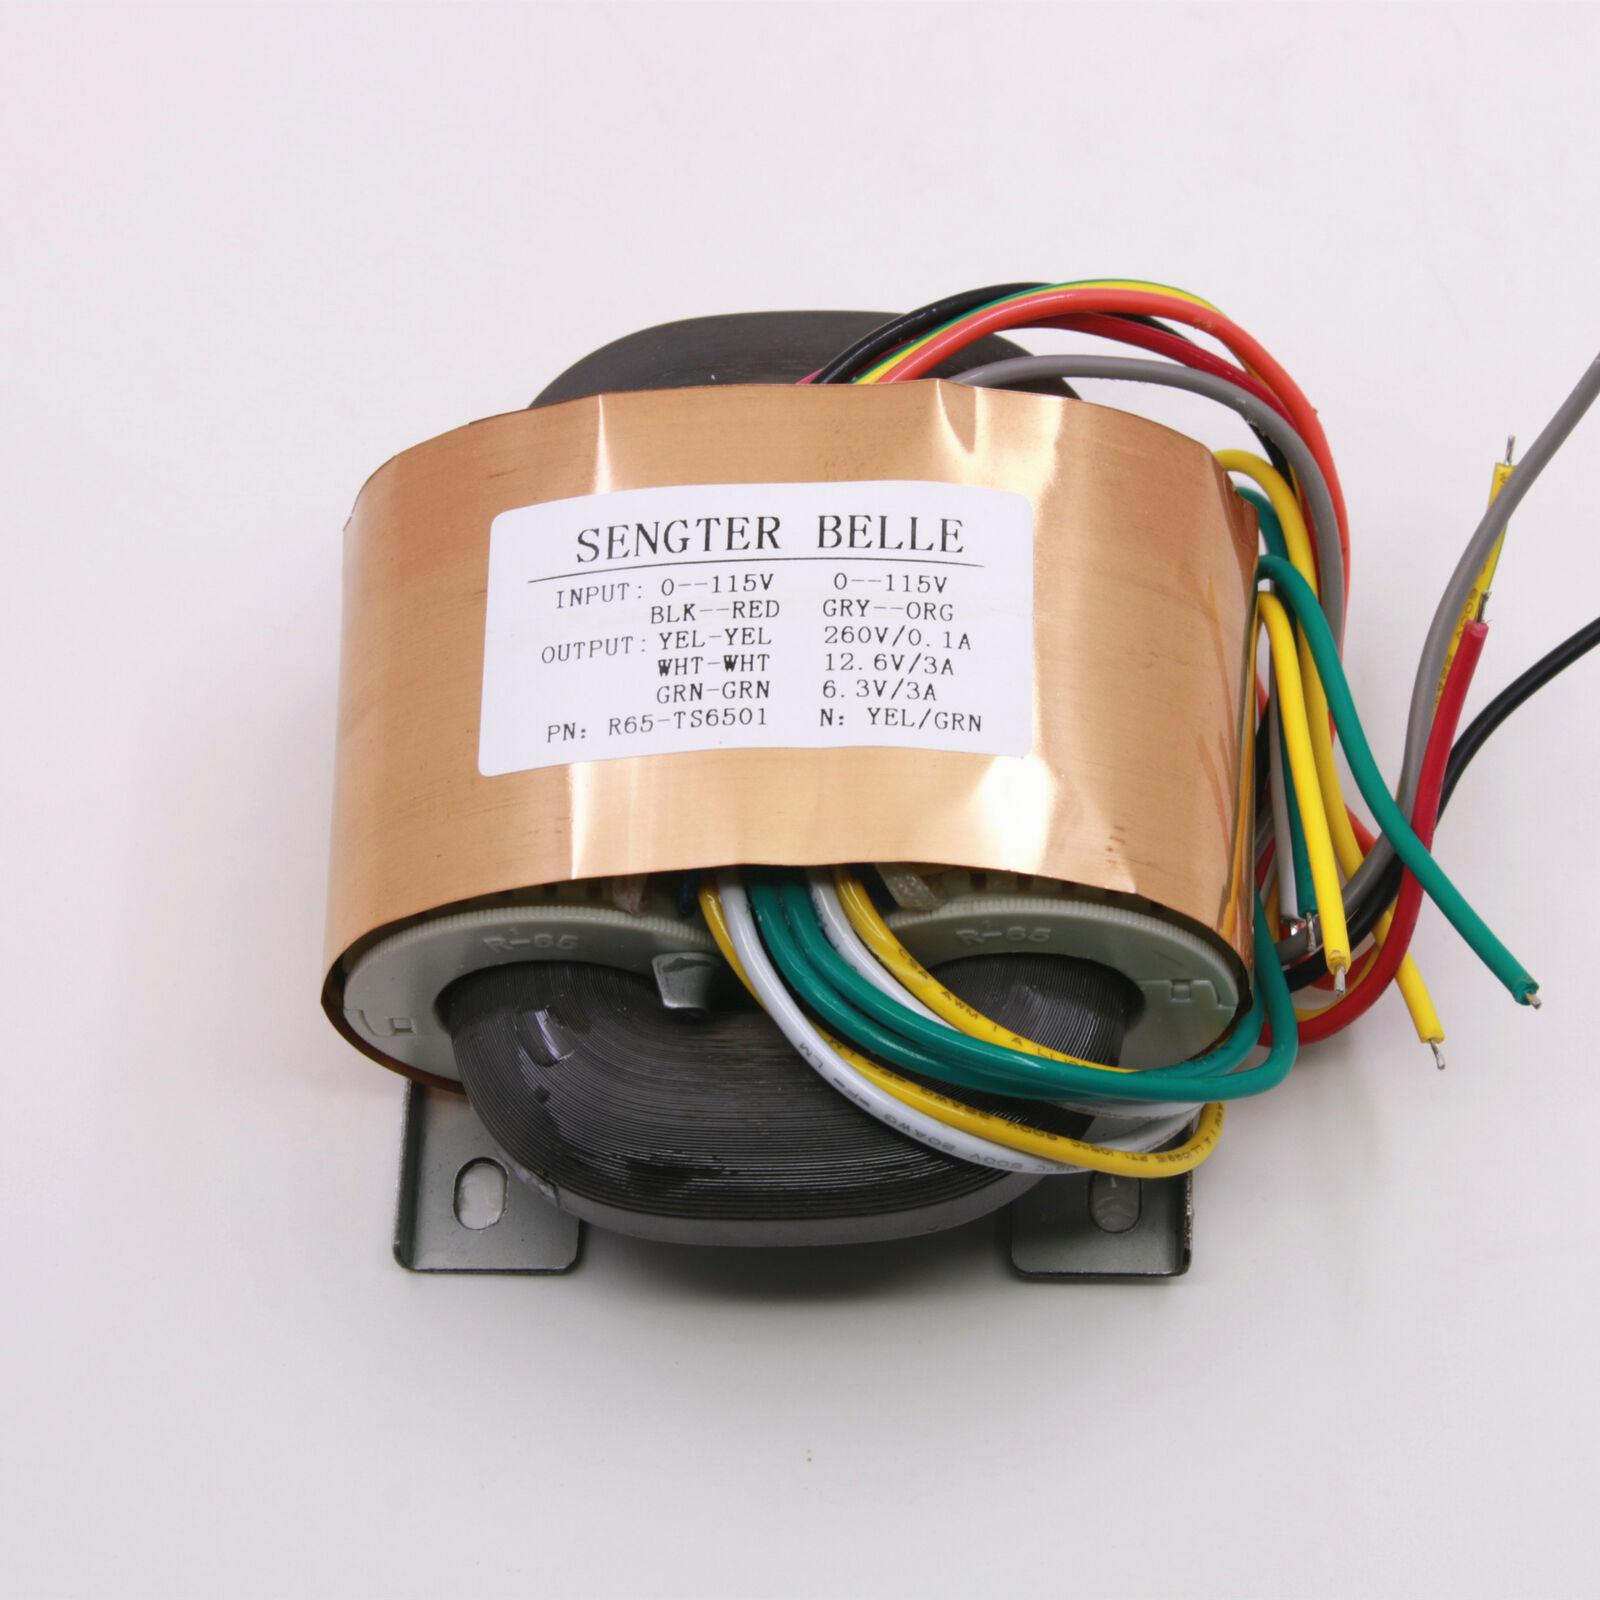 Transformador de salida Tipo R de cobre puro de 80W 0-260V 0-12,6 V 0-6,3 V para preamplificador de tubo